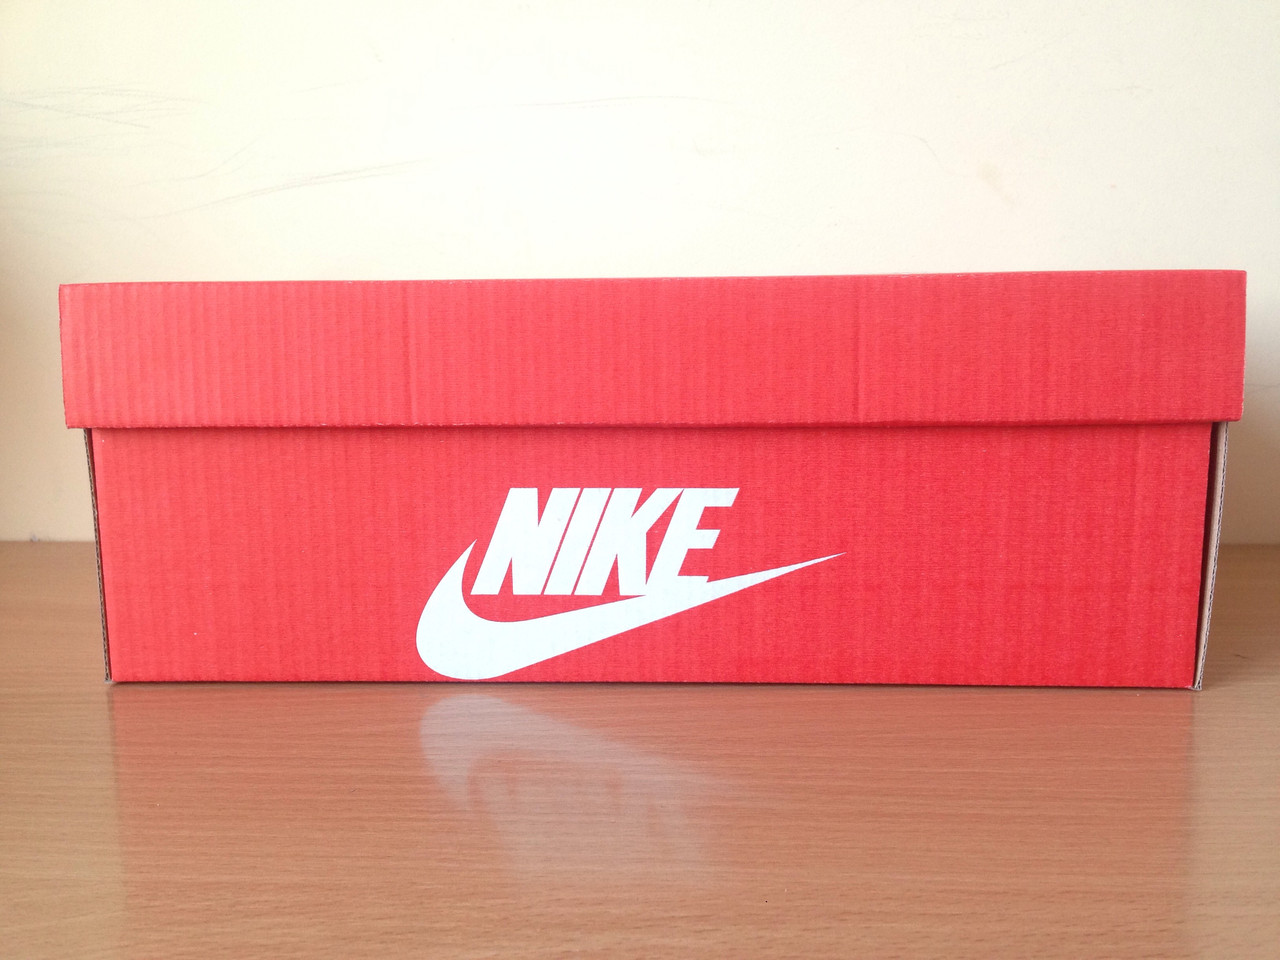 a7905eaa1228 Коробки Nike красного цвета купить в Киеве   Im-PoLLi - 323385407